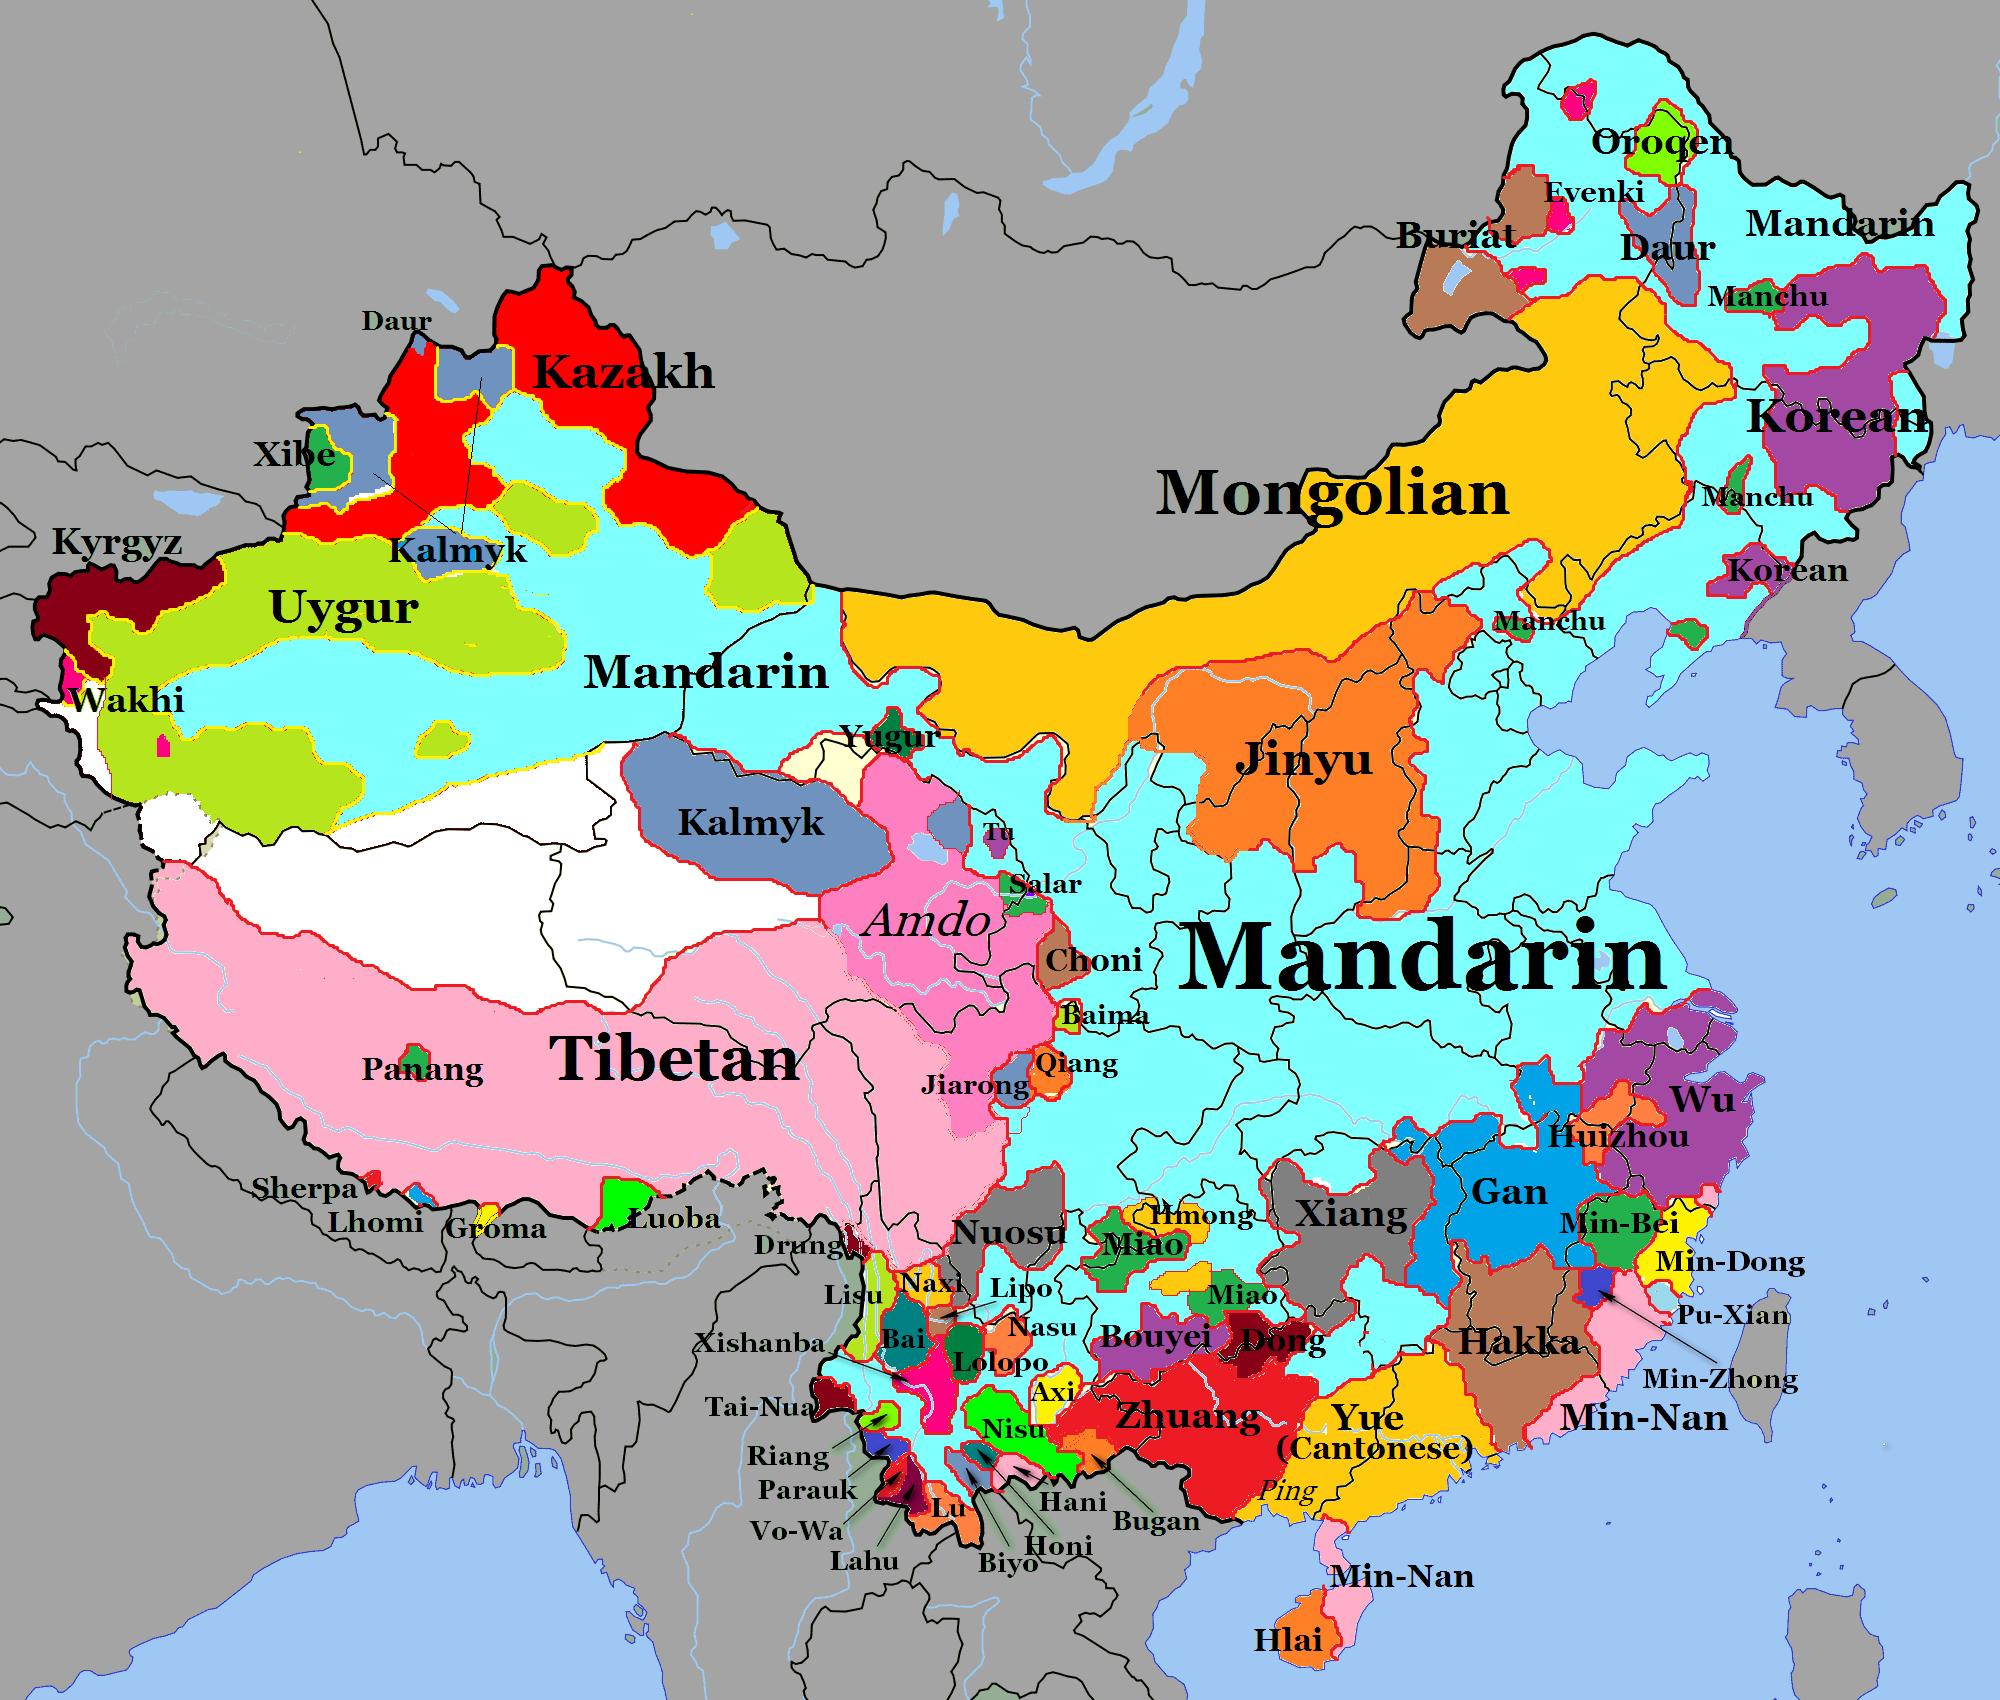 Languages of China   Geographie karte, Asien karte, Landkarte